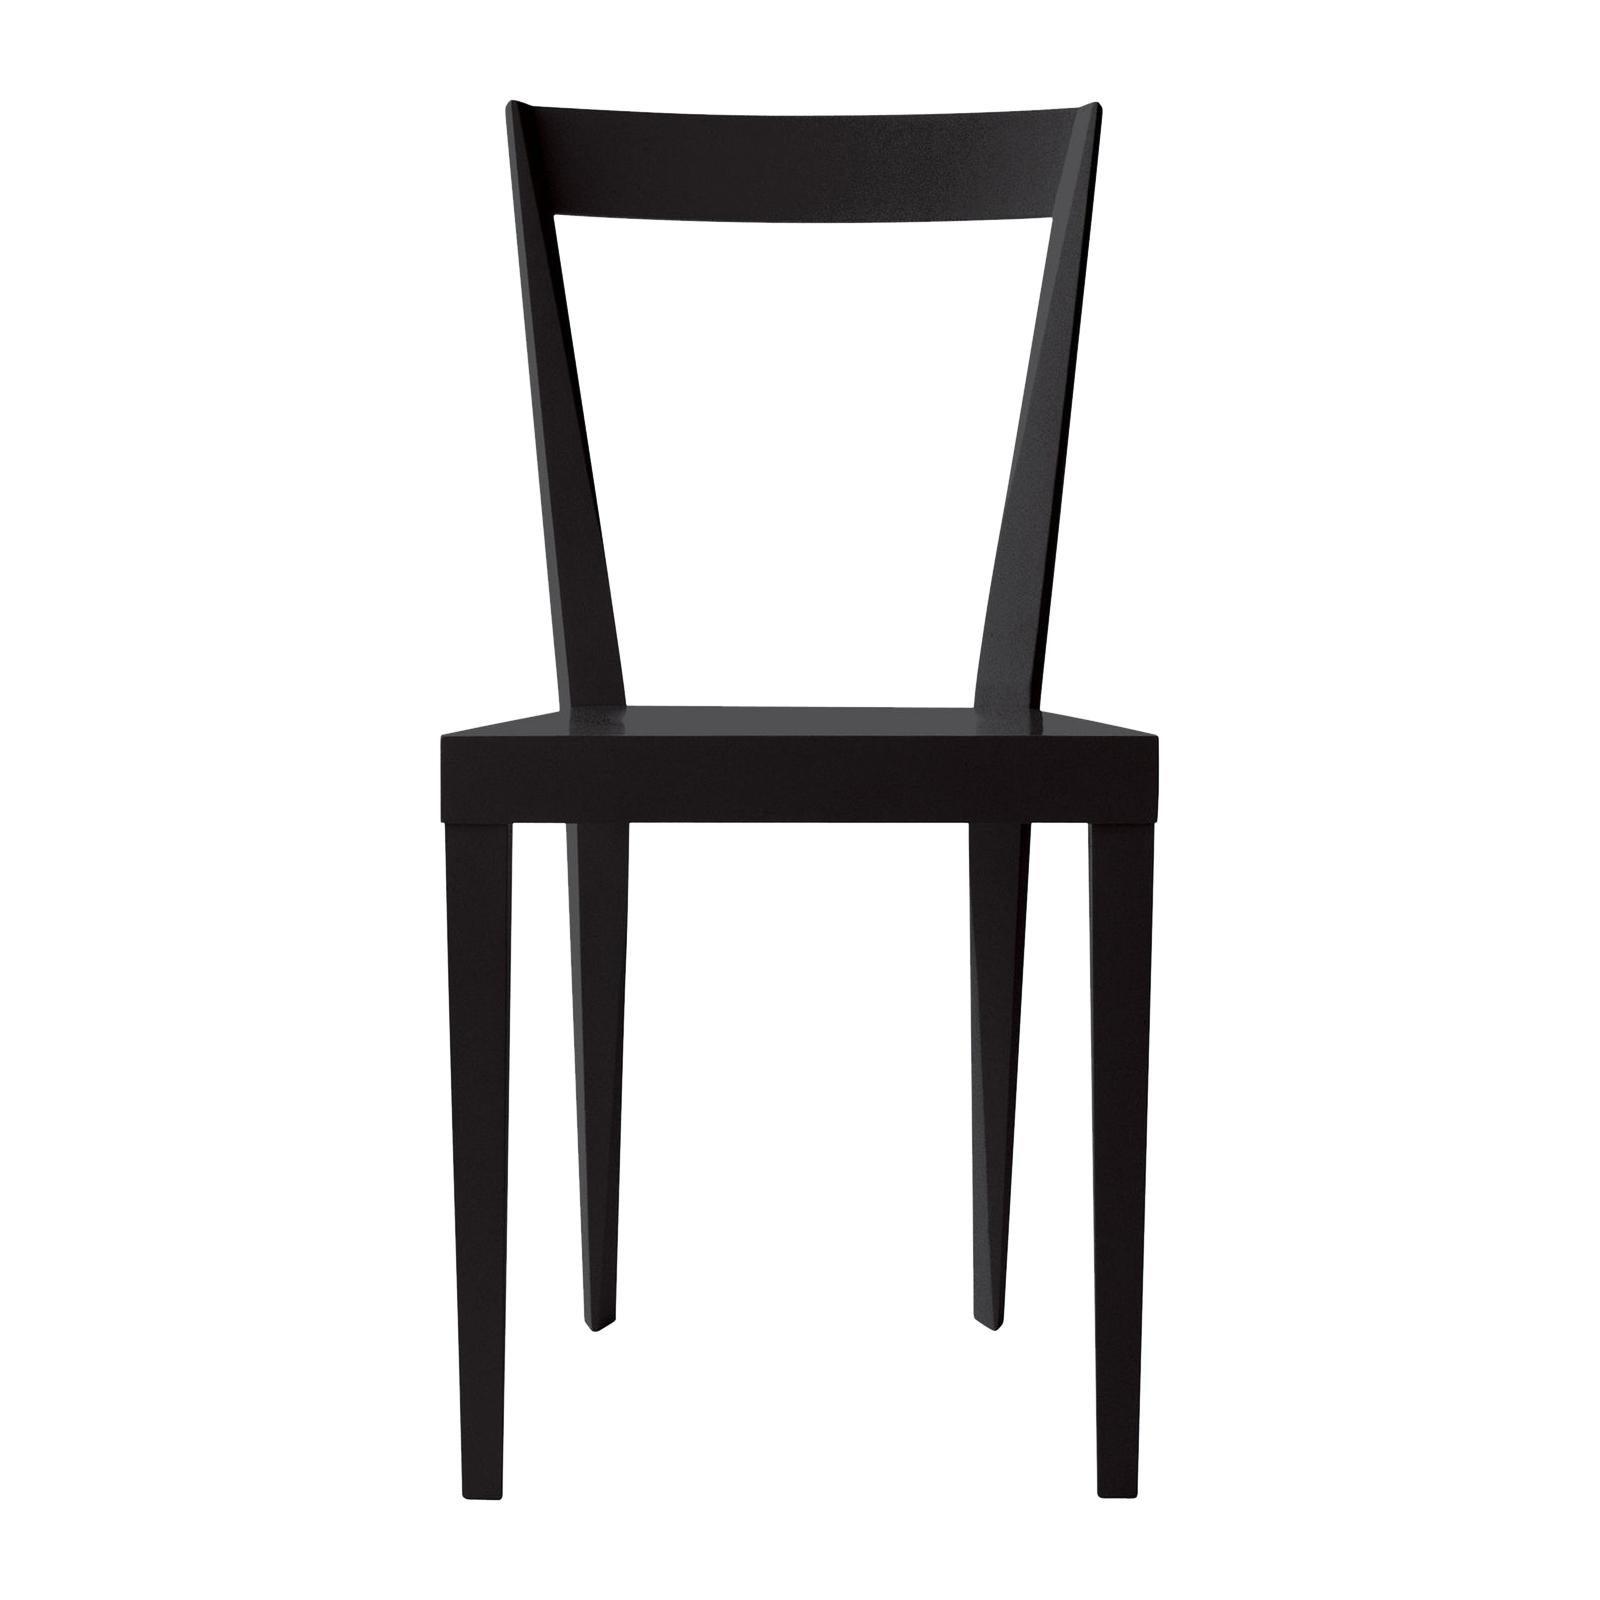 Set of 2 Livia Black Chairs by Gio Ponti